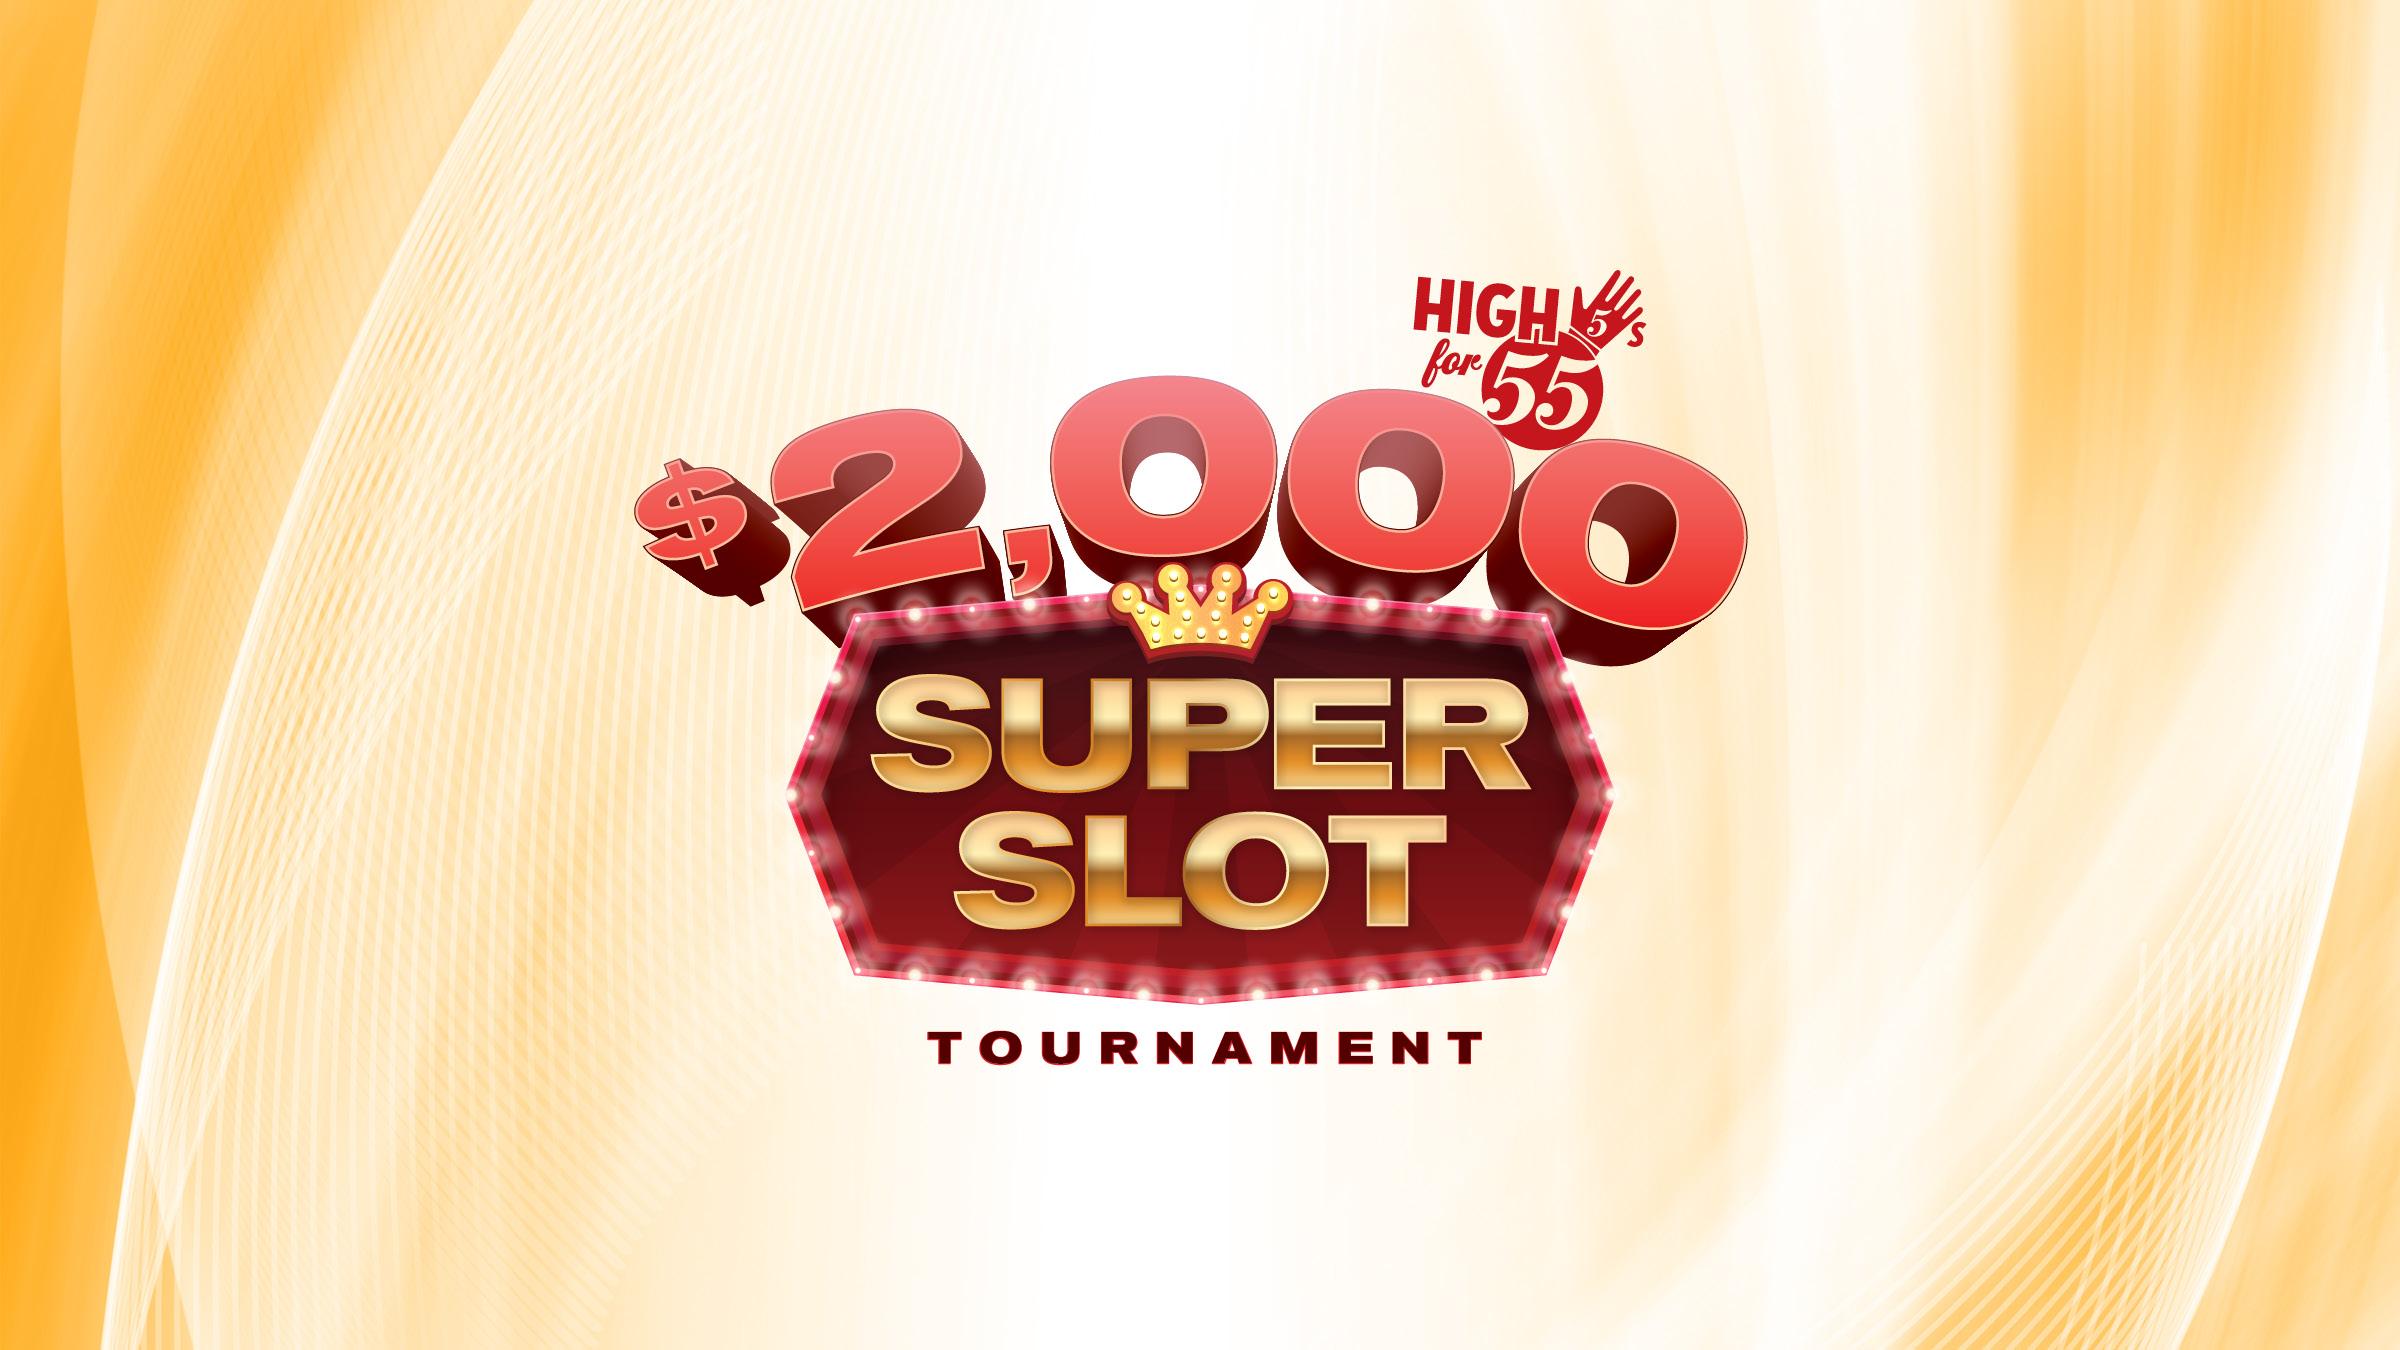 High 5s for 55s - Super Slot Tournament